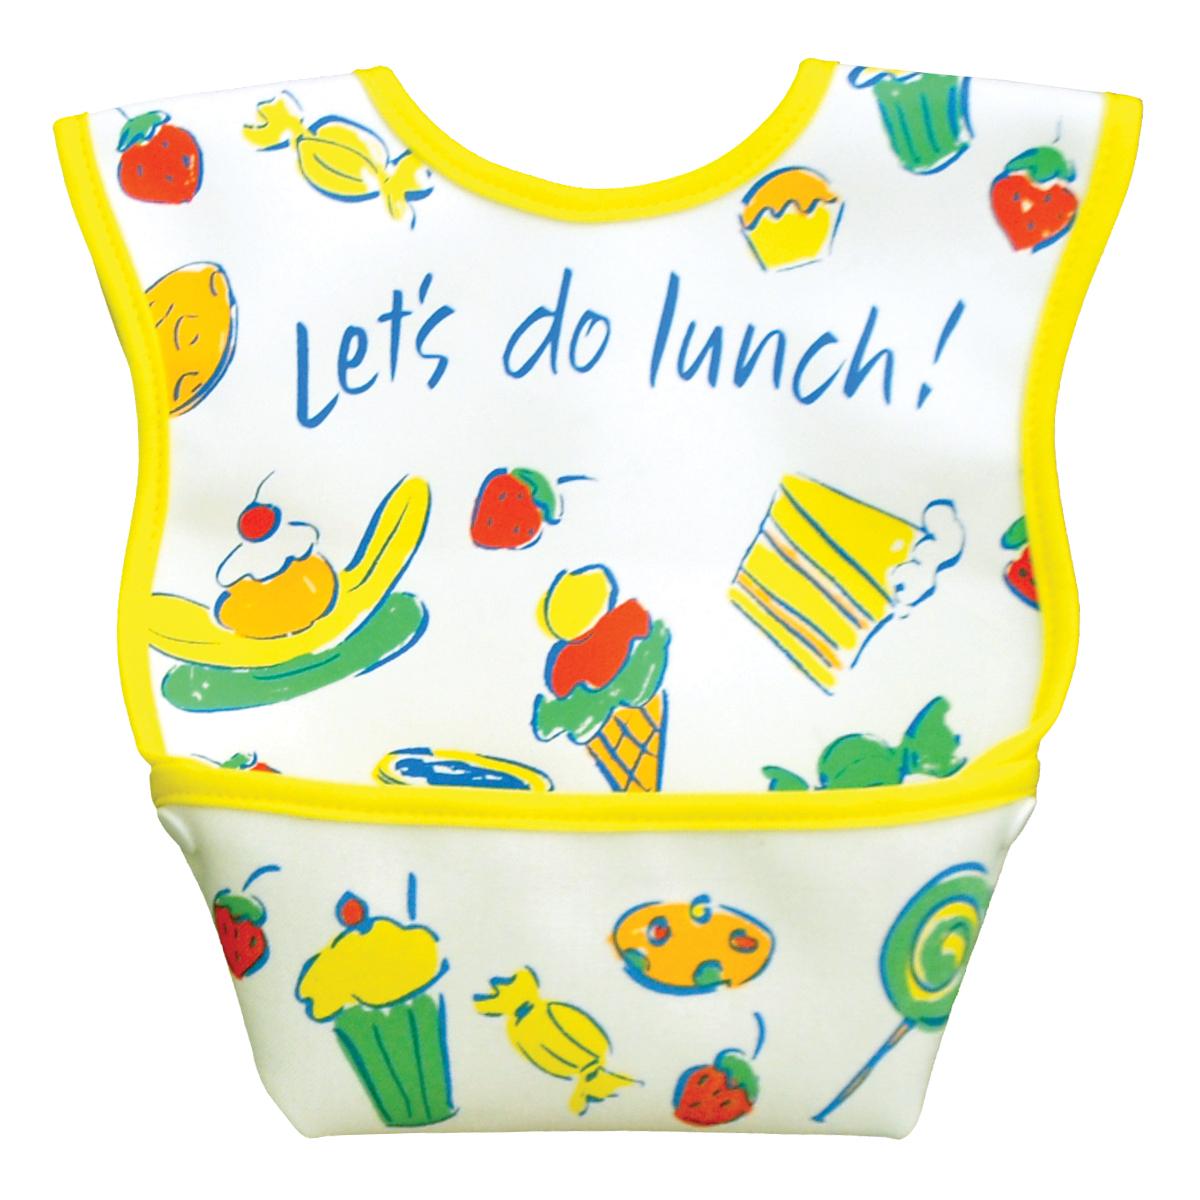 DBS-01_Lunch.jpg